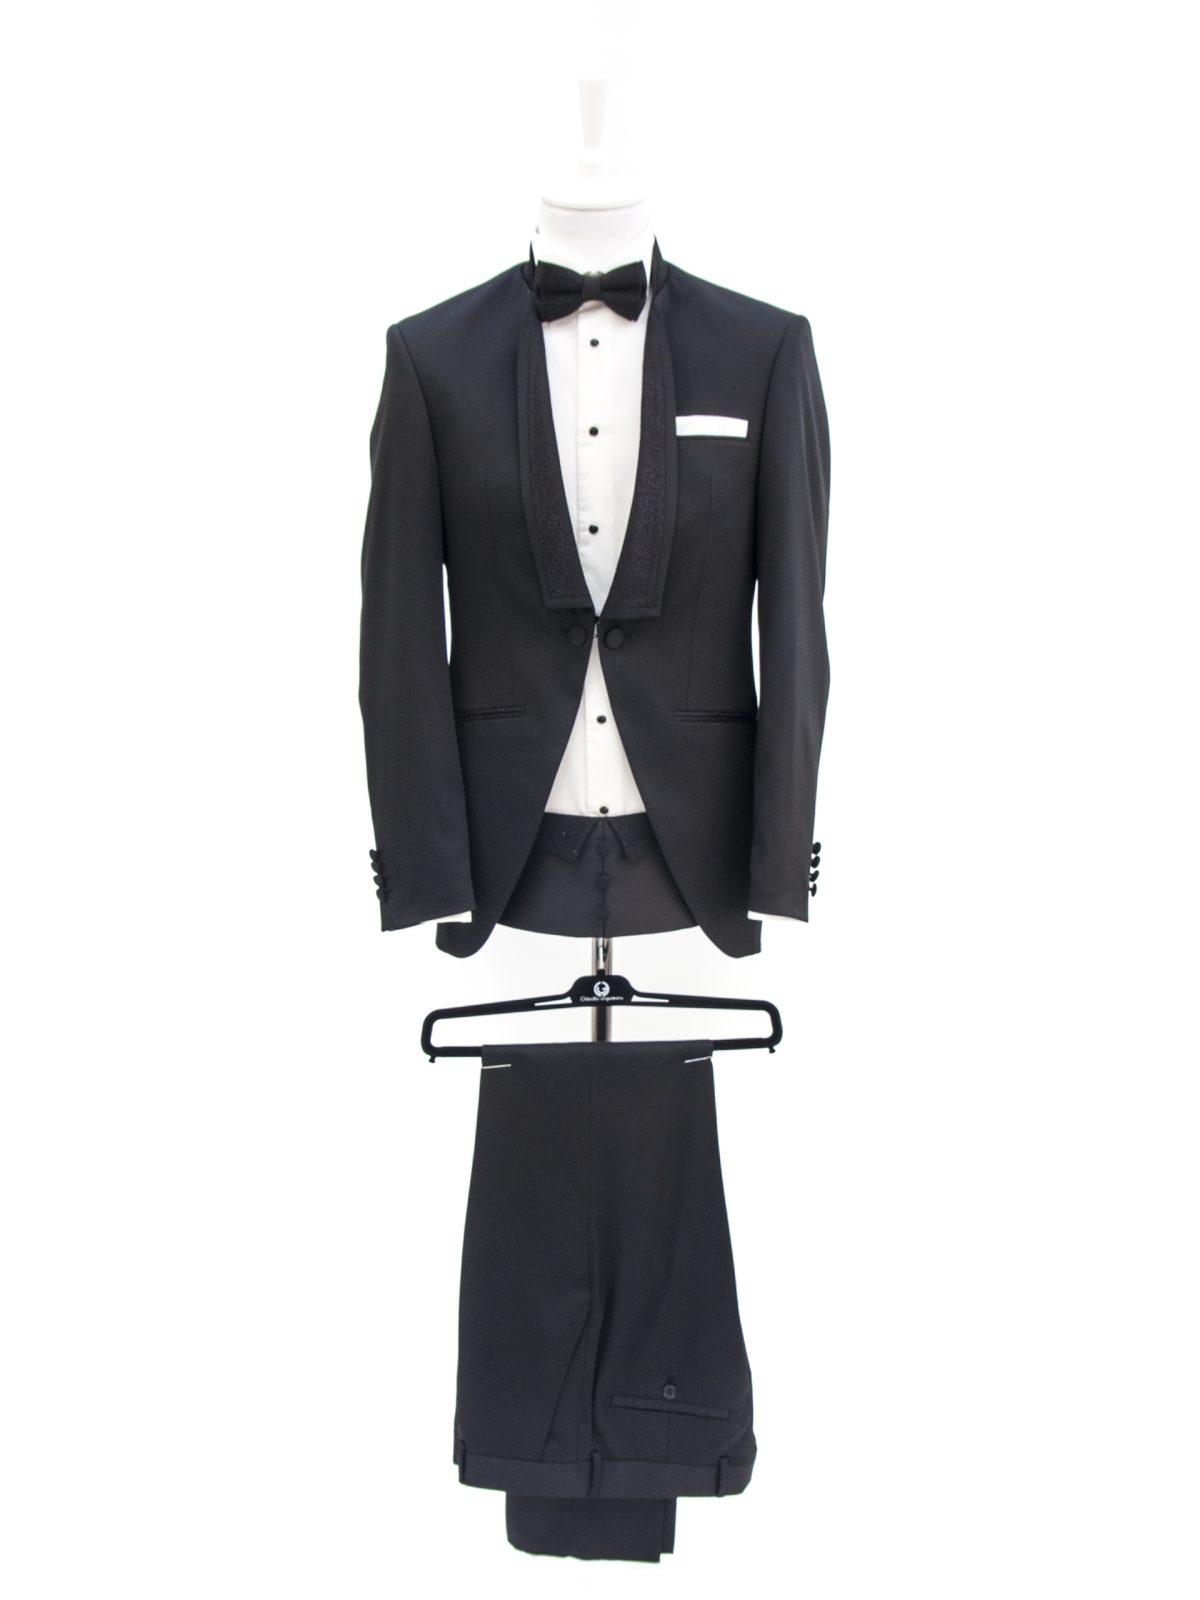 Bespoke Ceremony - Creative Black Suit Reinterpretat